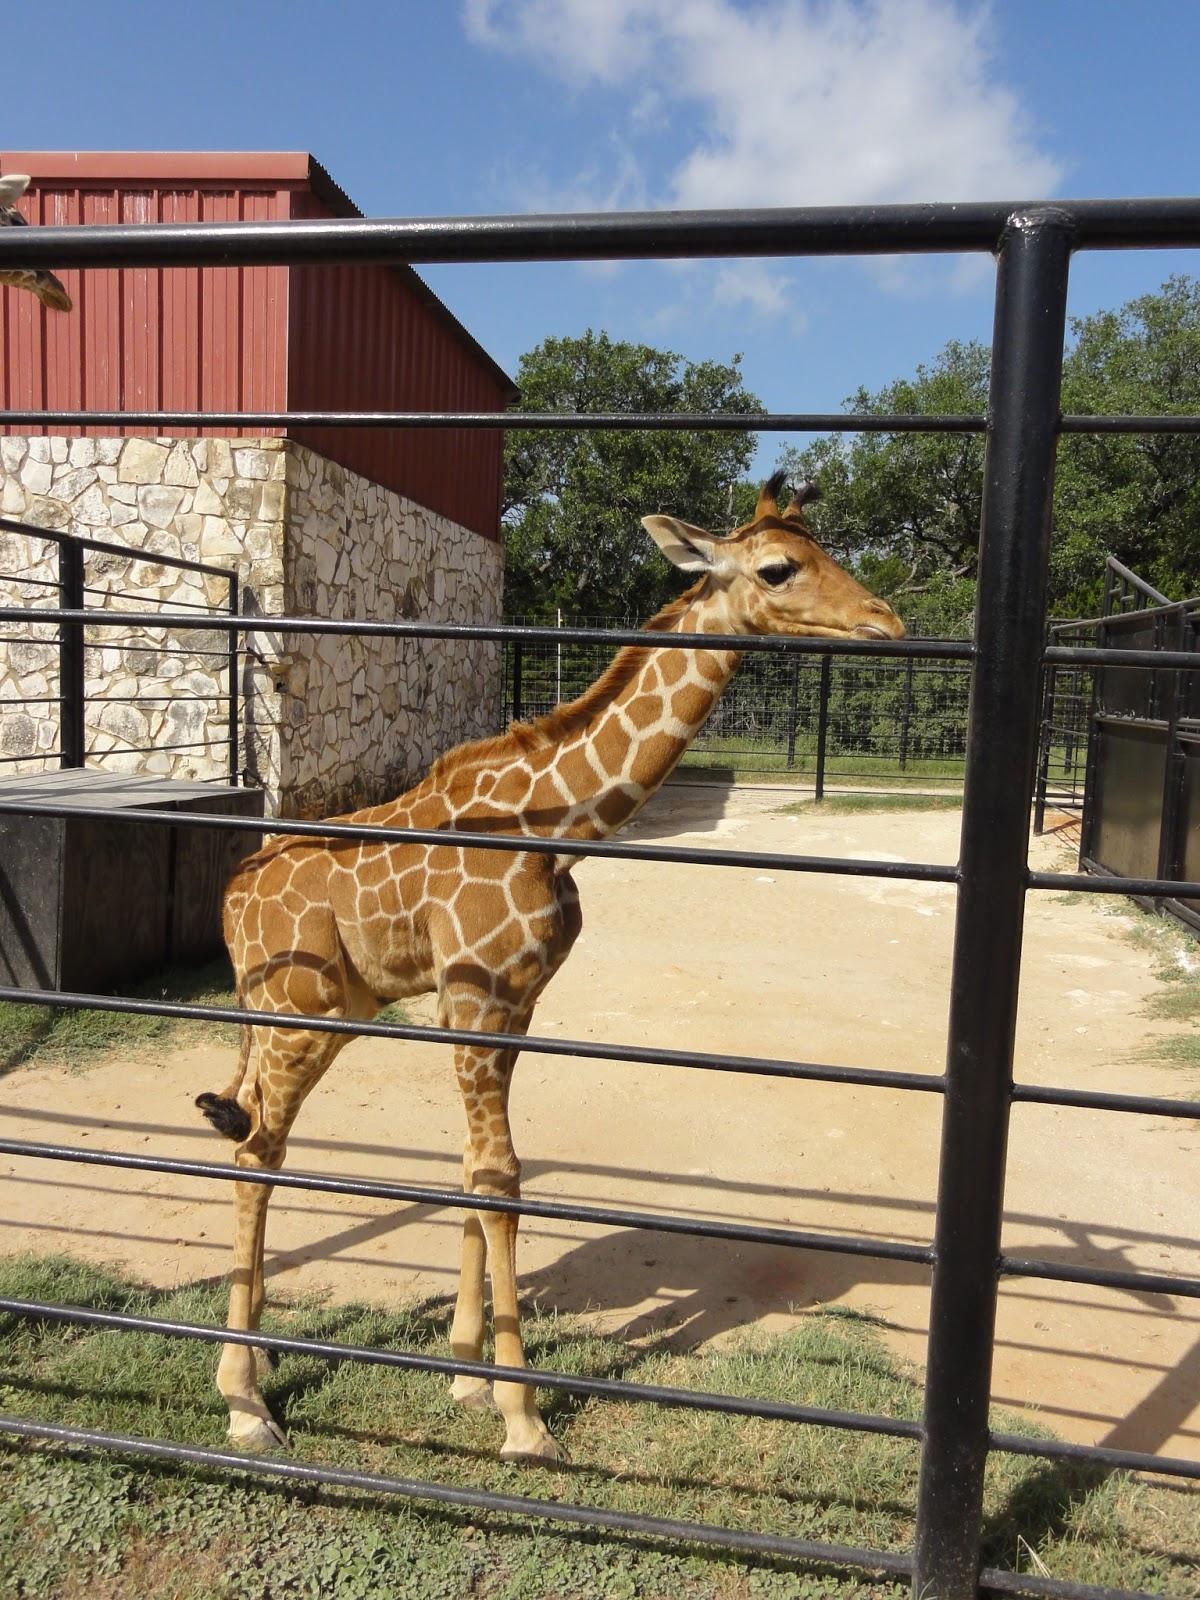 Austin Top 50 Fun In The Sun Natural Bridge Wildlife